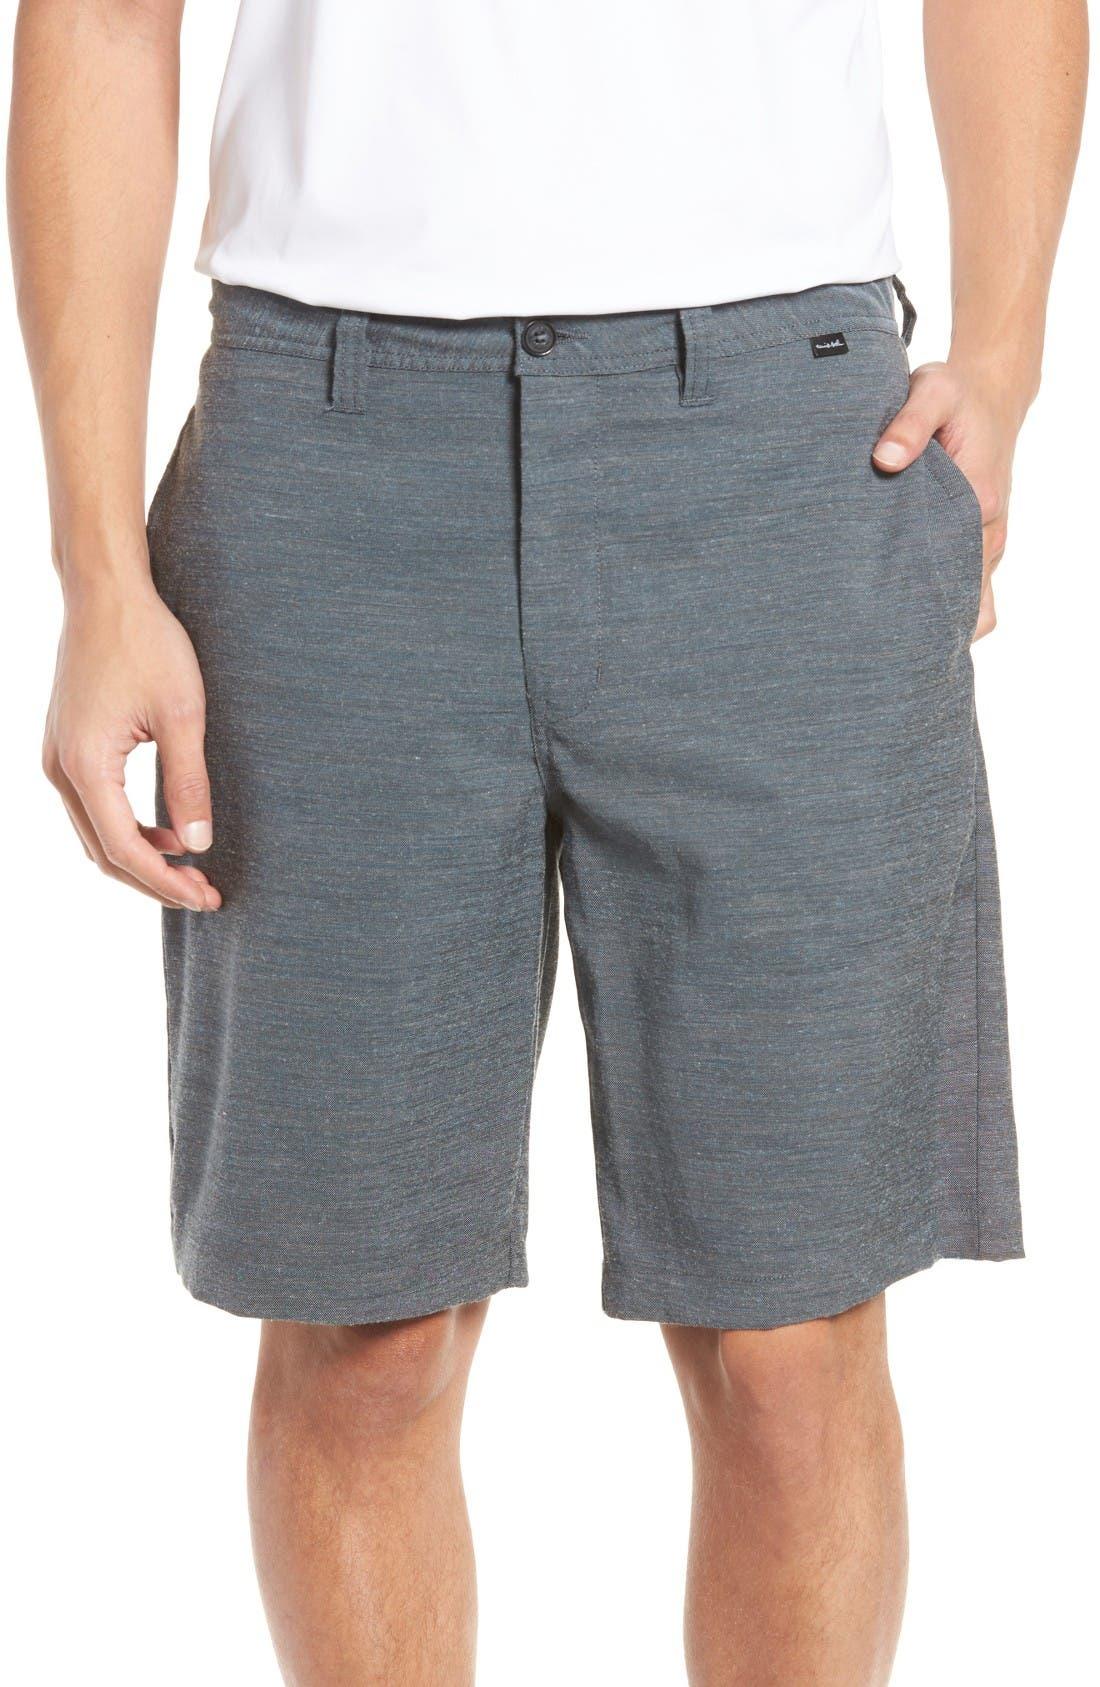 Travis Mathew Romers Stretch Shorts